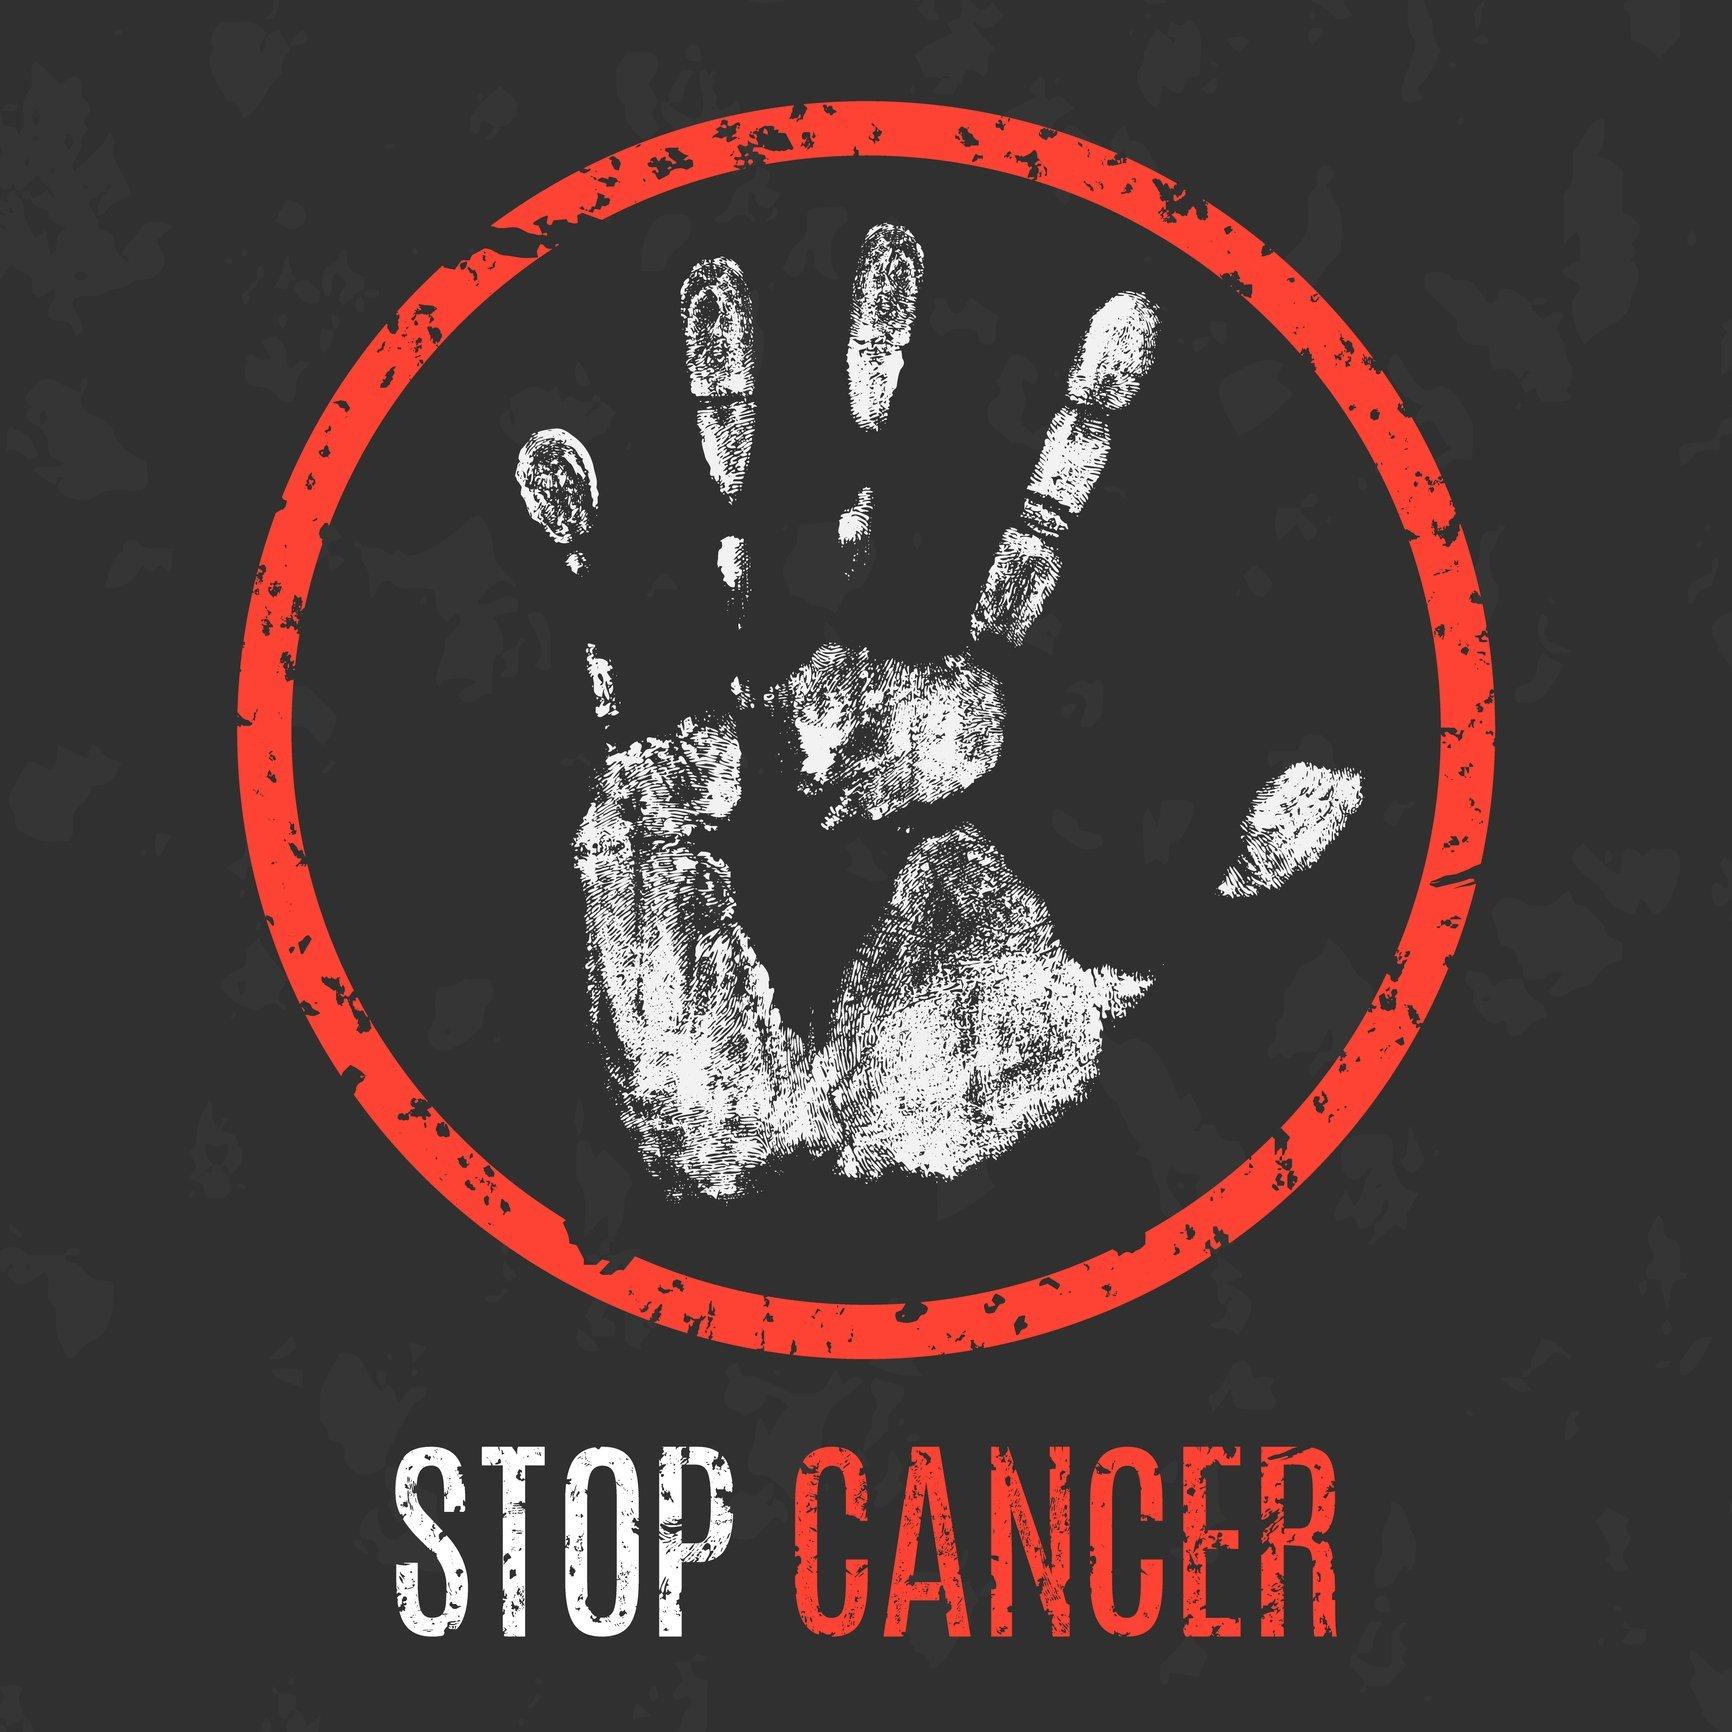 Tumor cancer pain